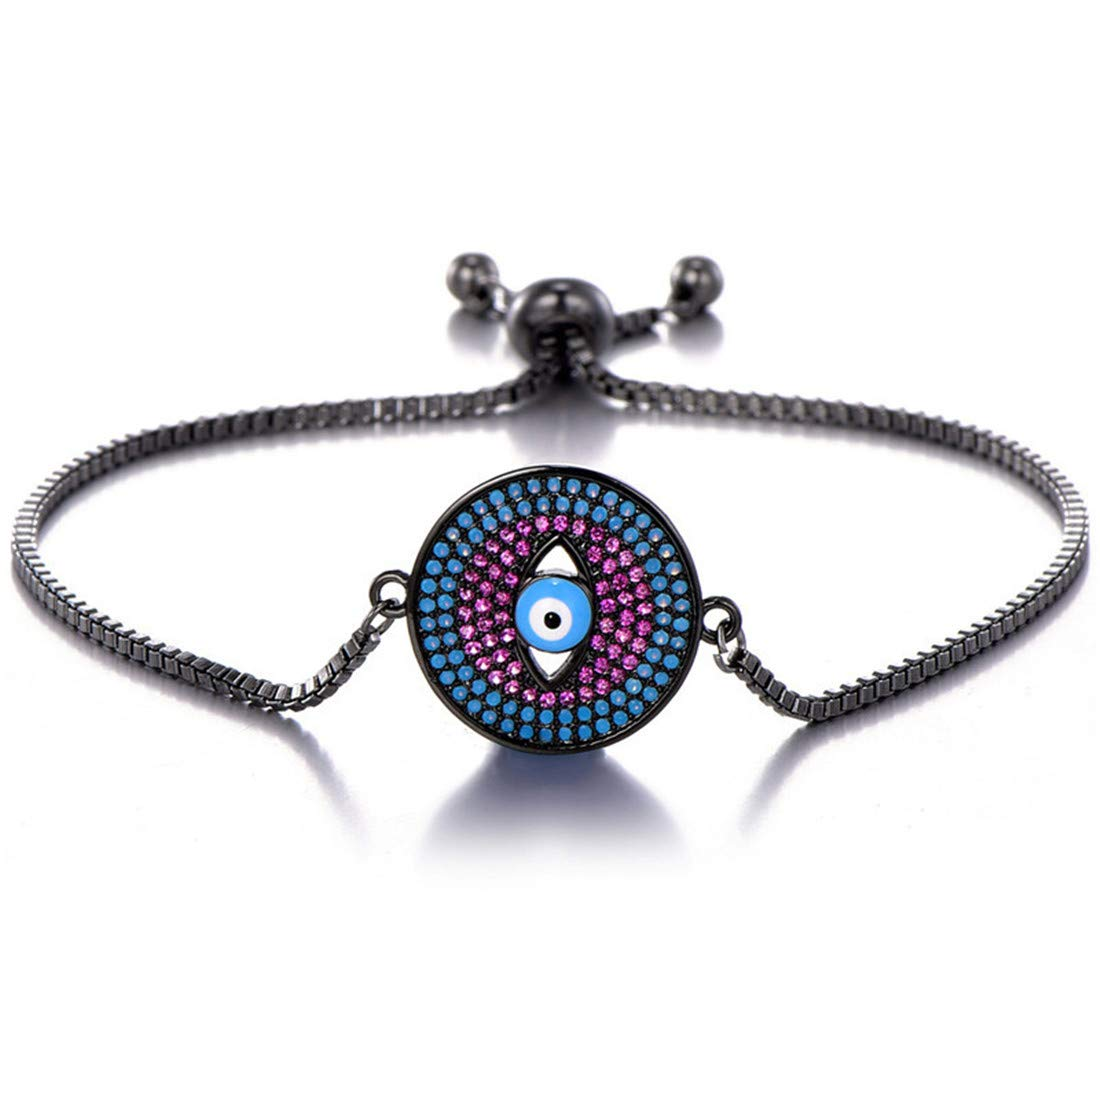 Mrsrui Clear Crystal Rhinestone Wedding Link Tennis Bracelet Costume Jewelry Lady Valentines Gift (B) by Mrsrui